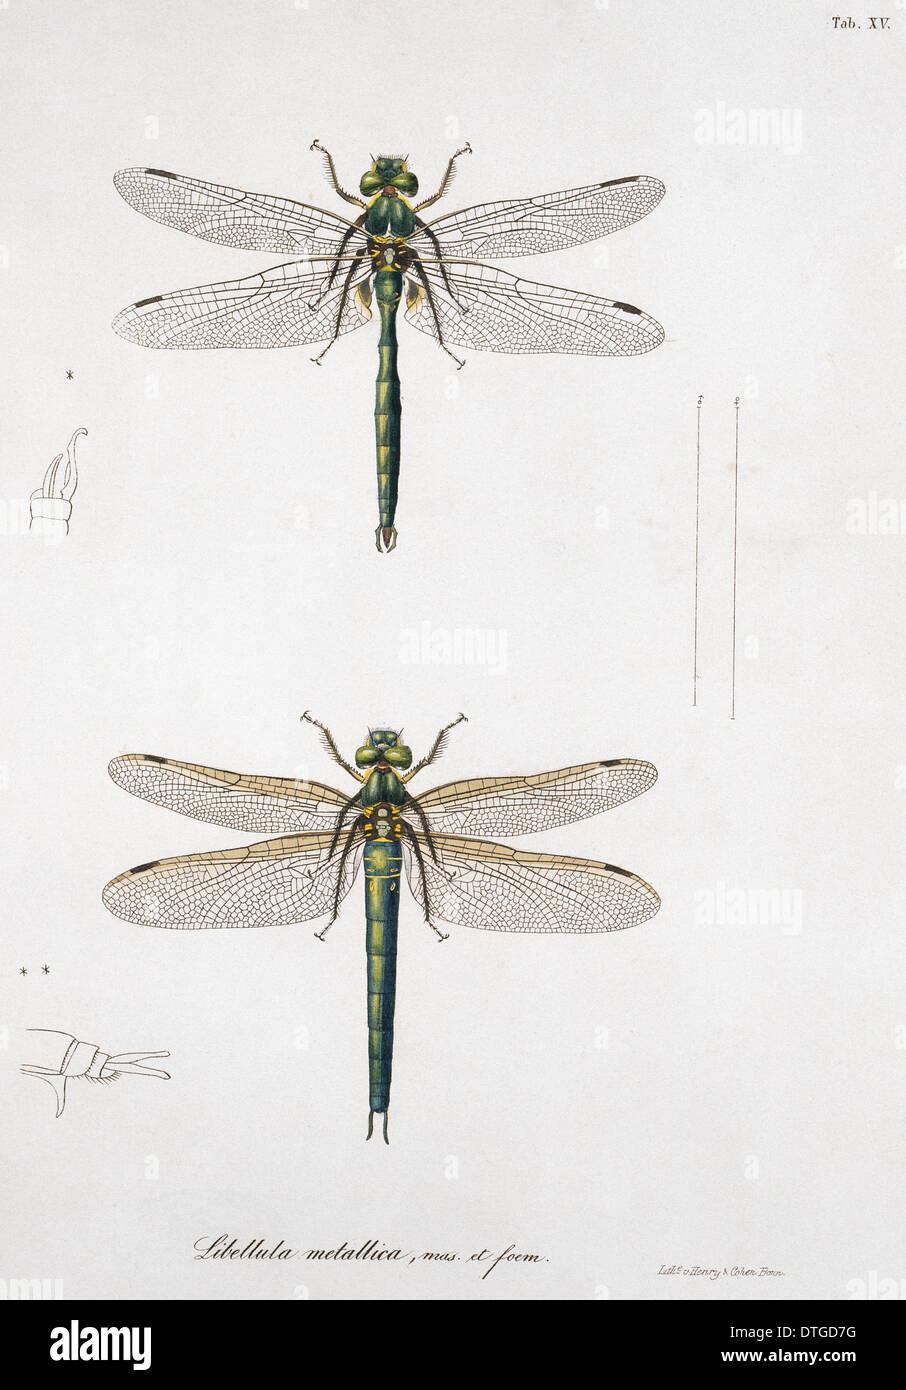 15 Chapa de Libellulinae Europaeae por de Charpentier Imagen De Stock